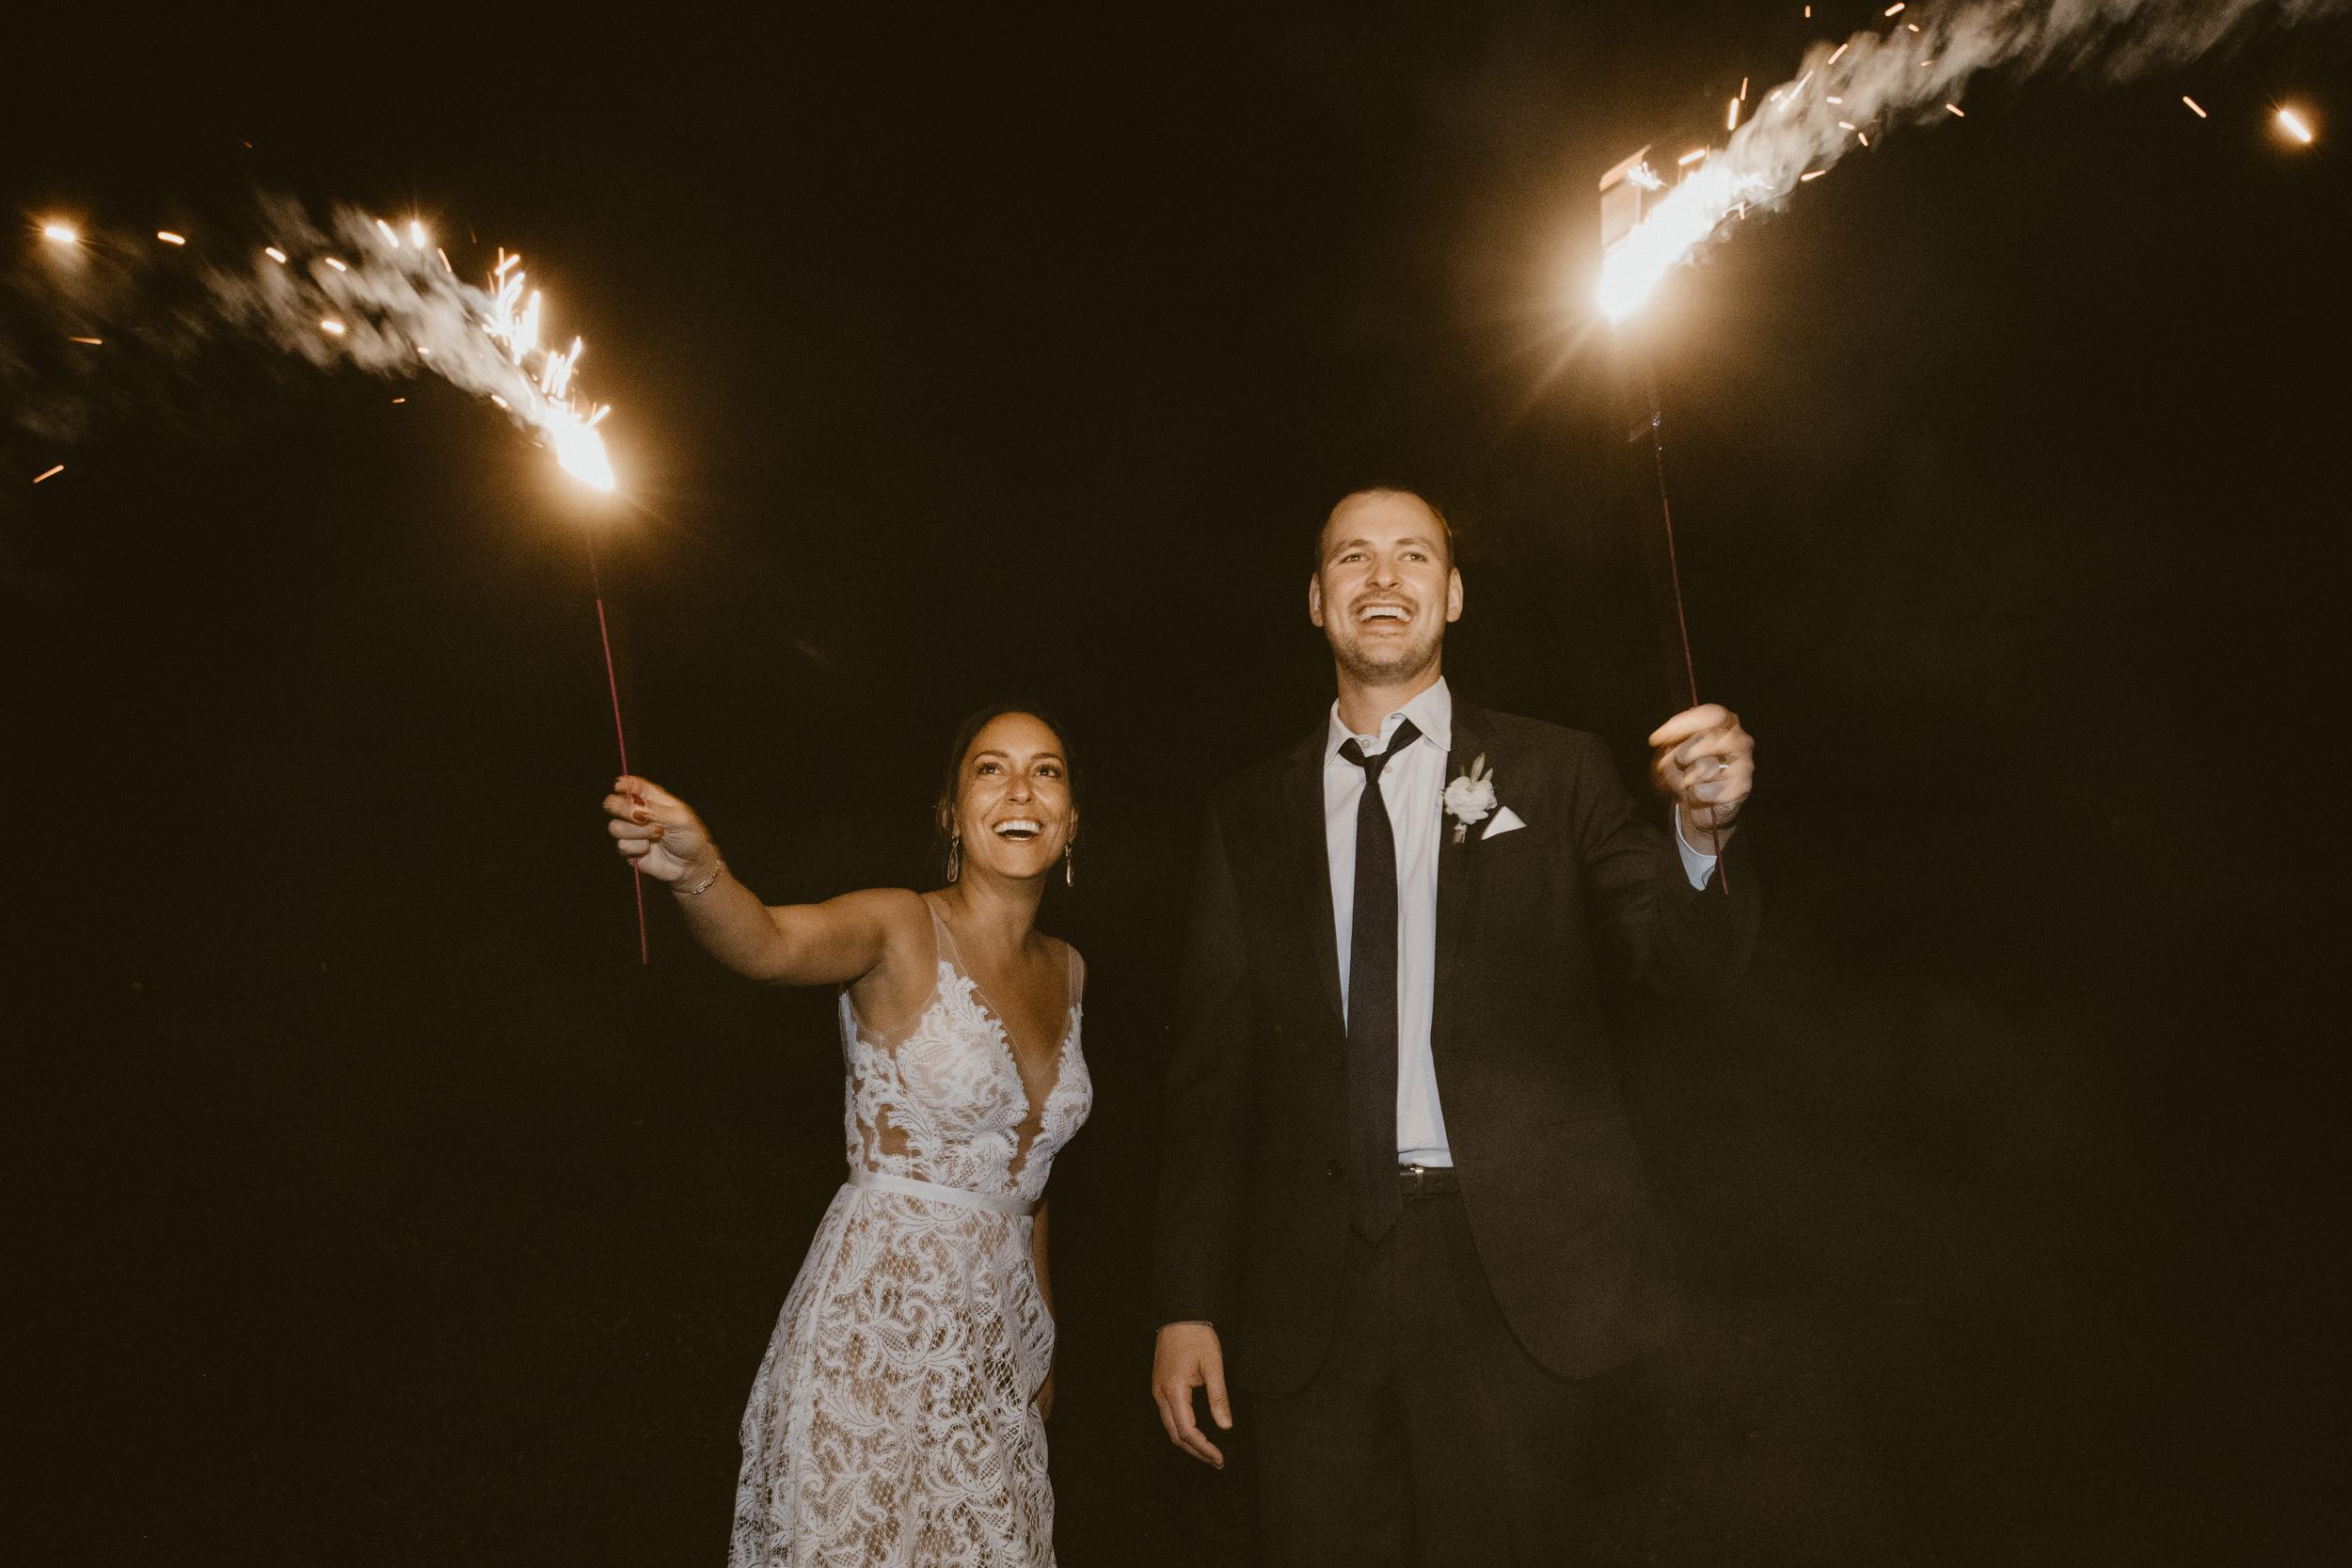 maine_wedding_photographers_002.jpg